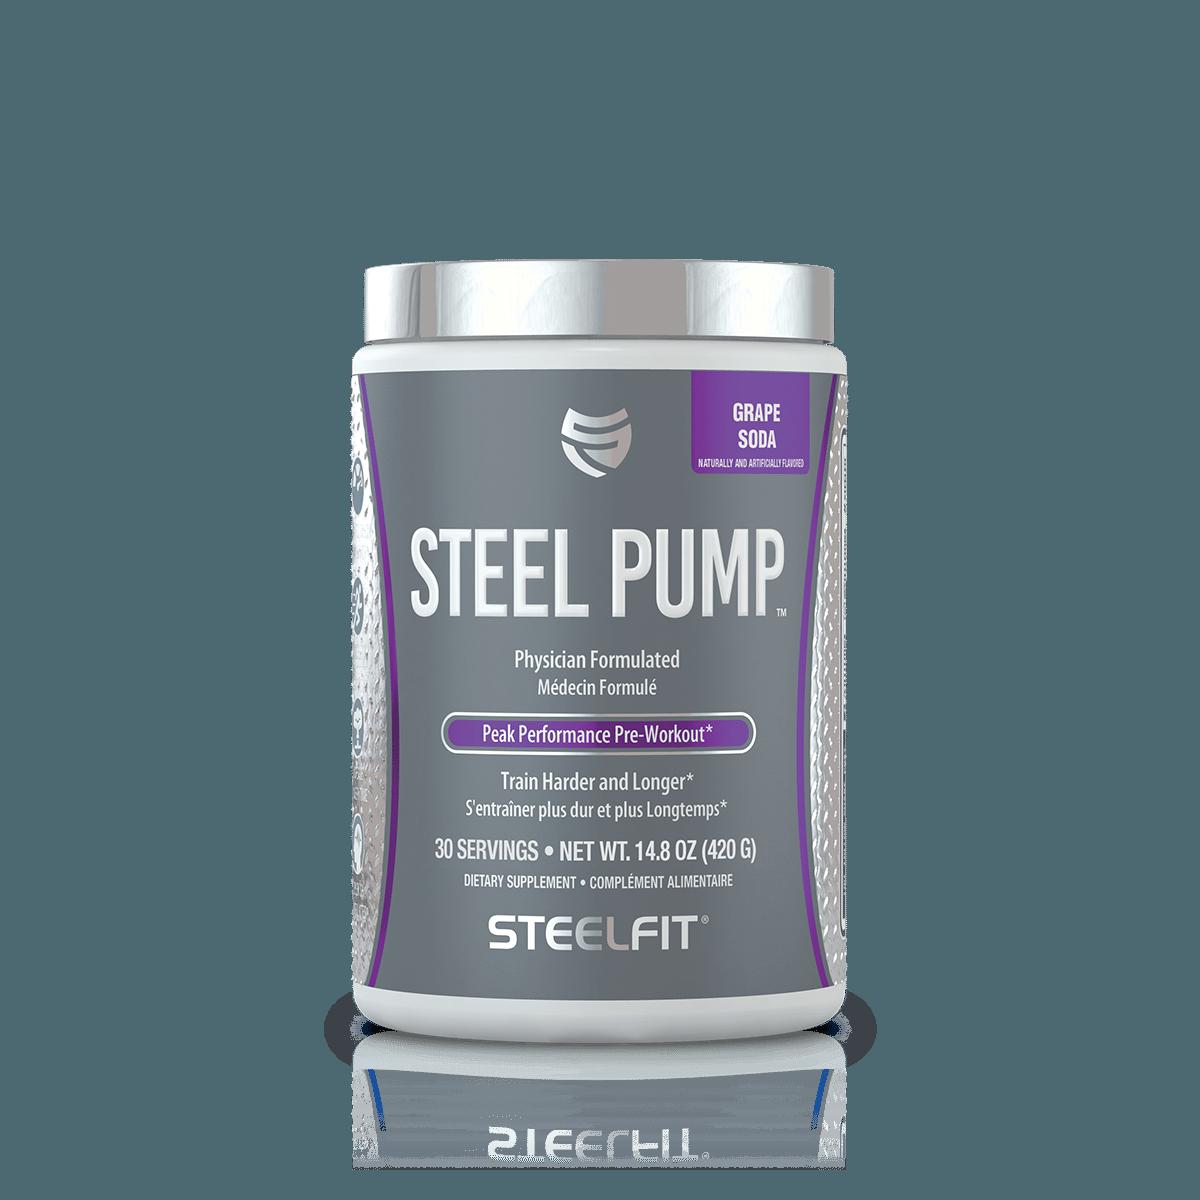 Steel Pump SteelFit Generation Iron